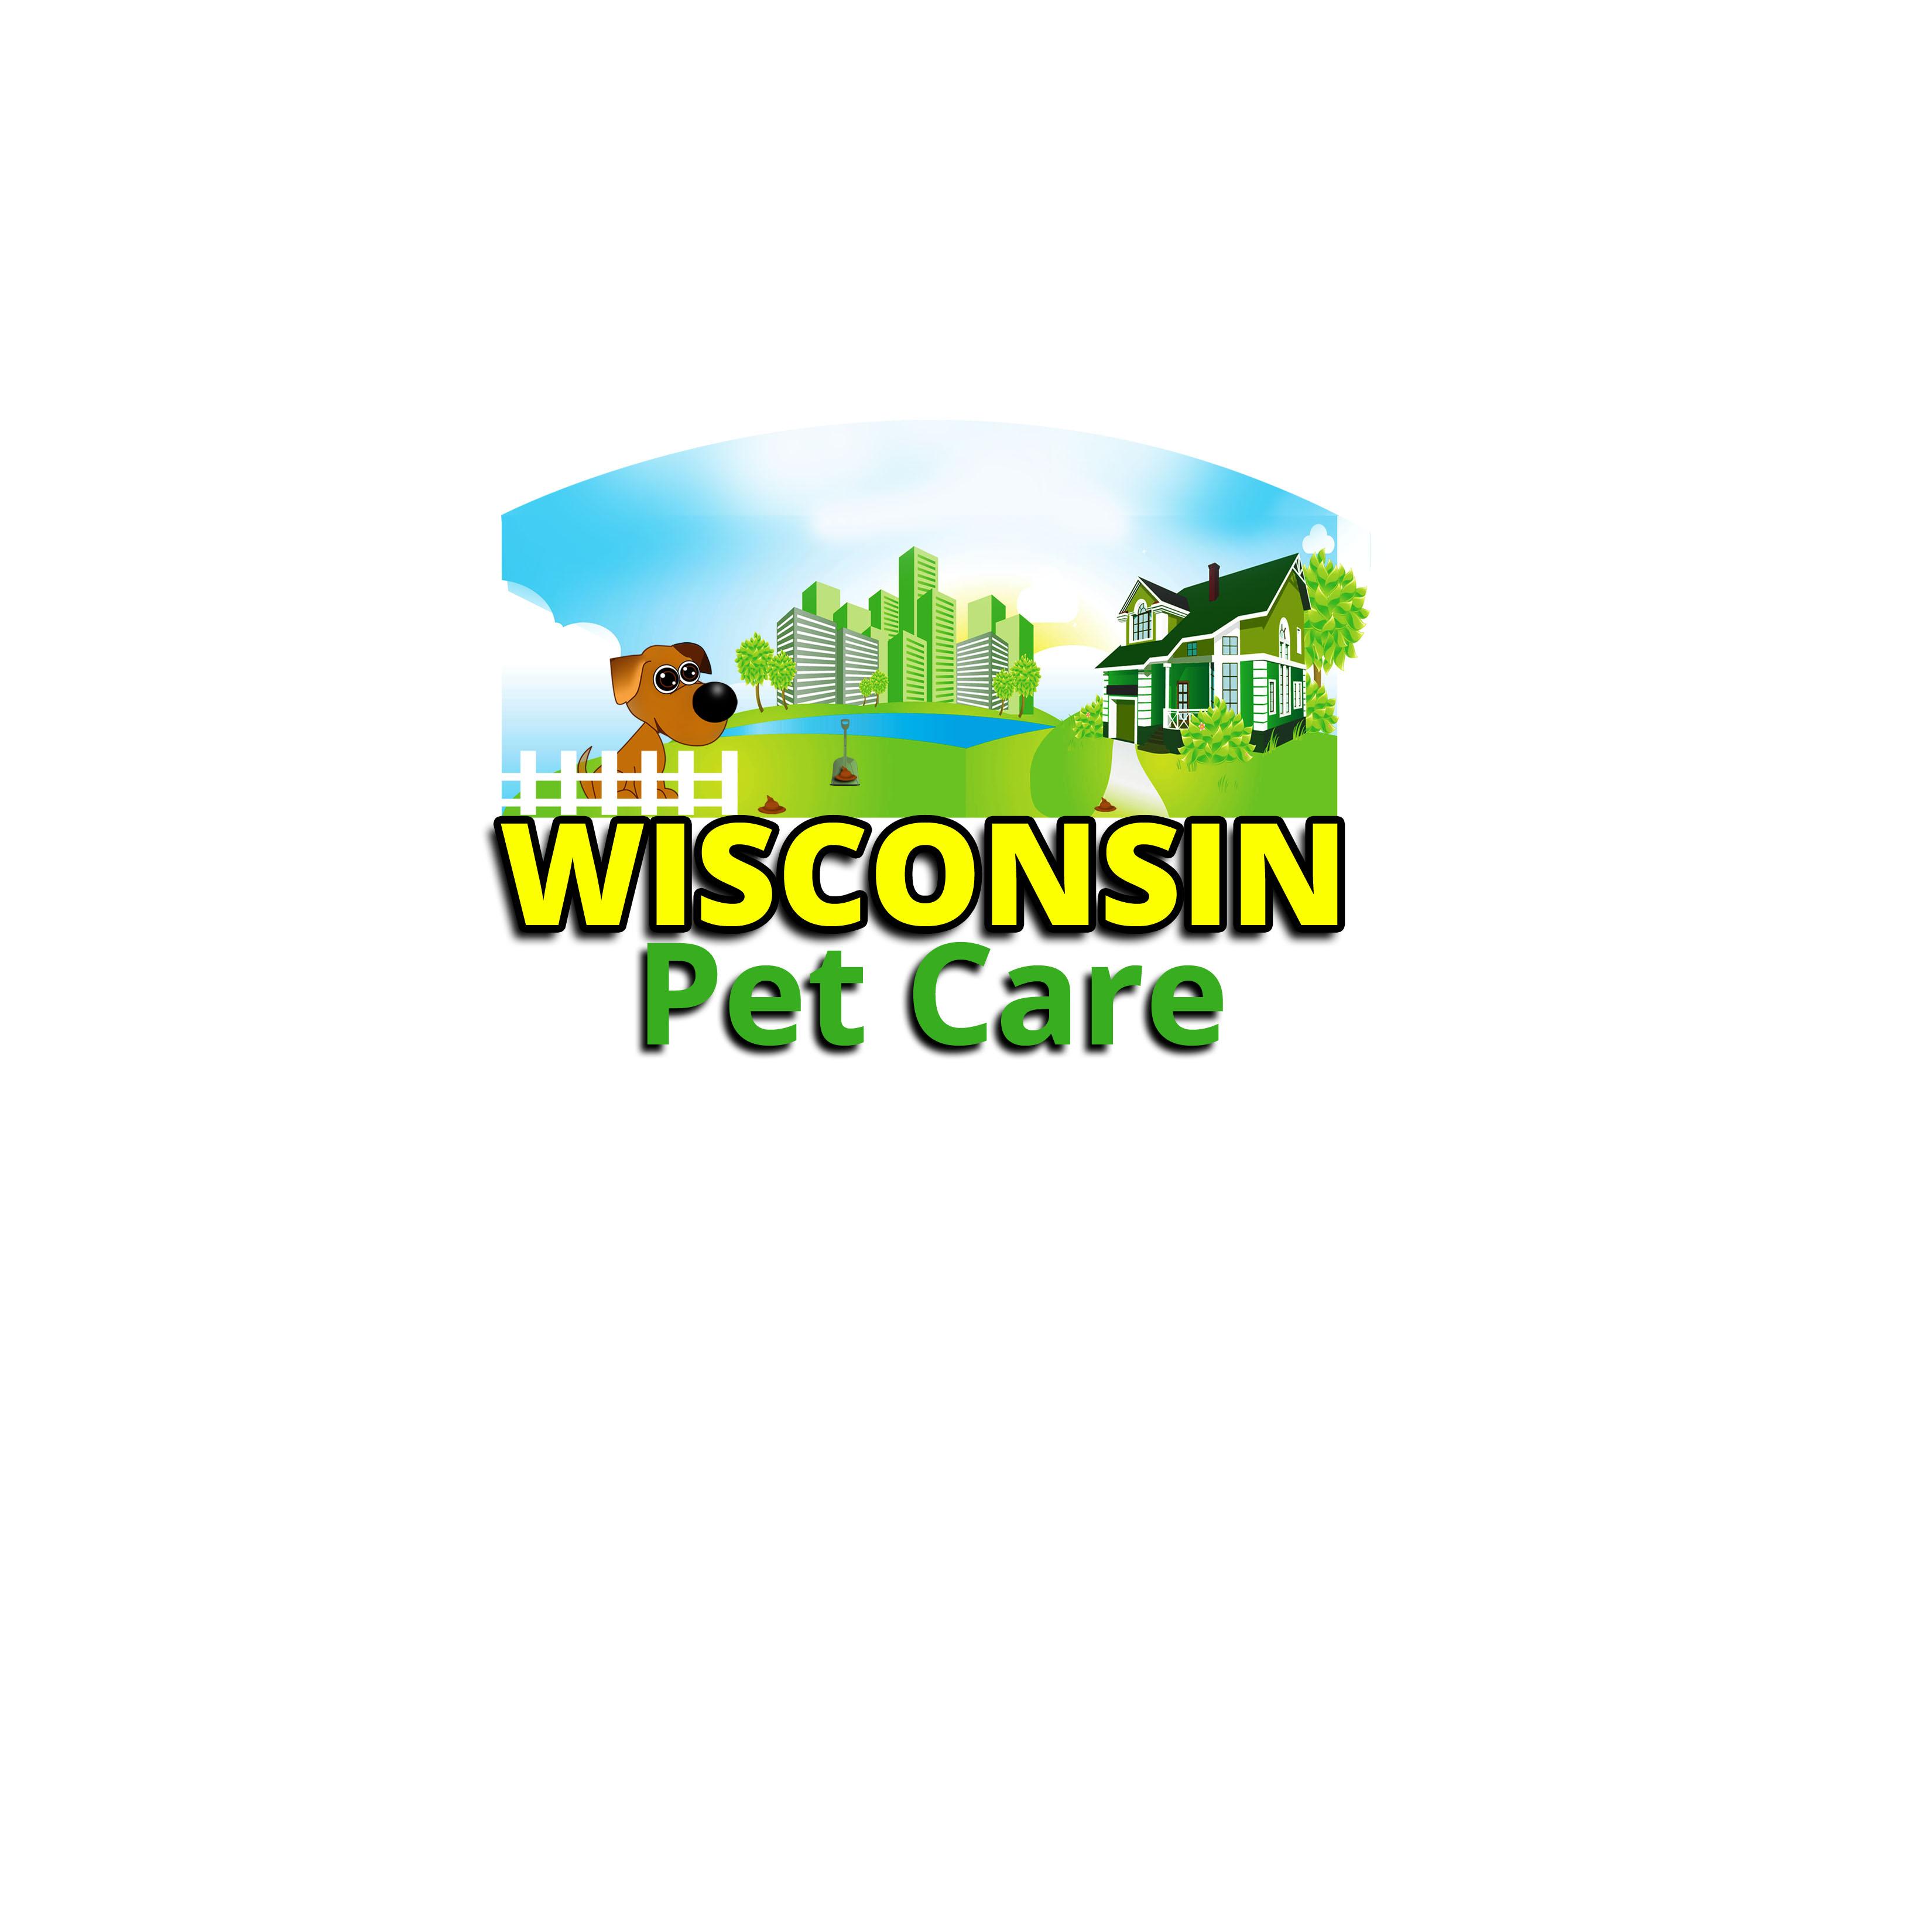 Logo Design by Allan Esclamado - Entry No. 43 in the Logo Design Contest Captivating Logo Design for Wisconsin Pet Care.